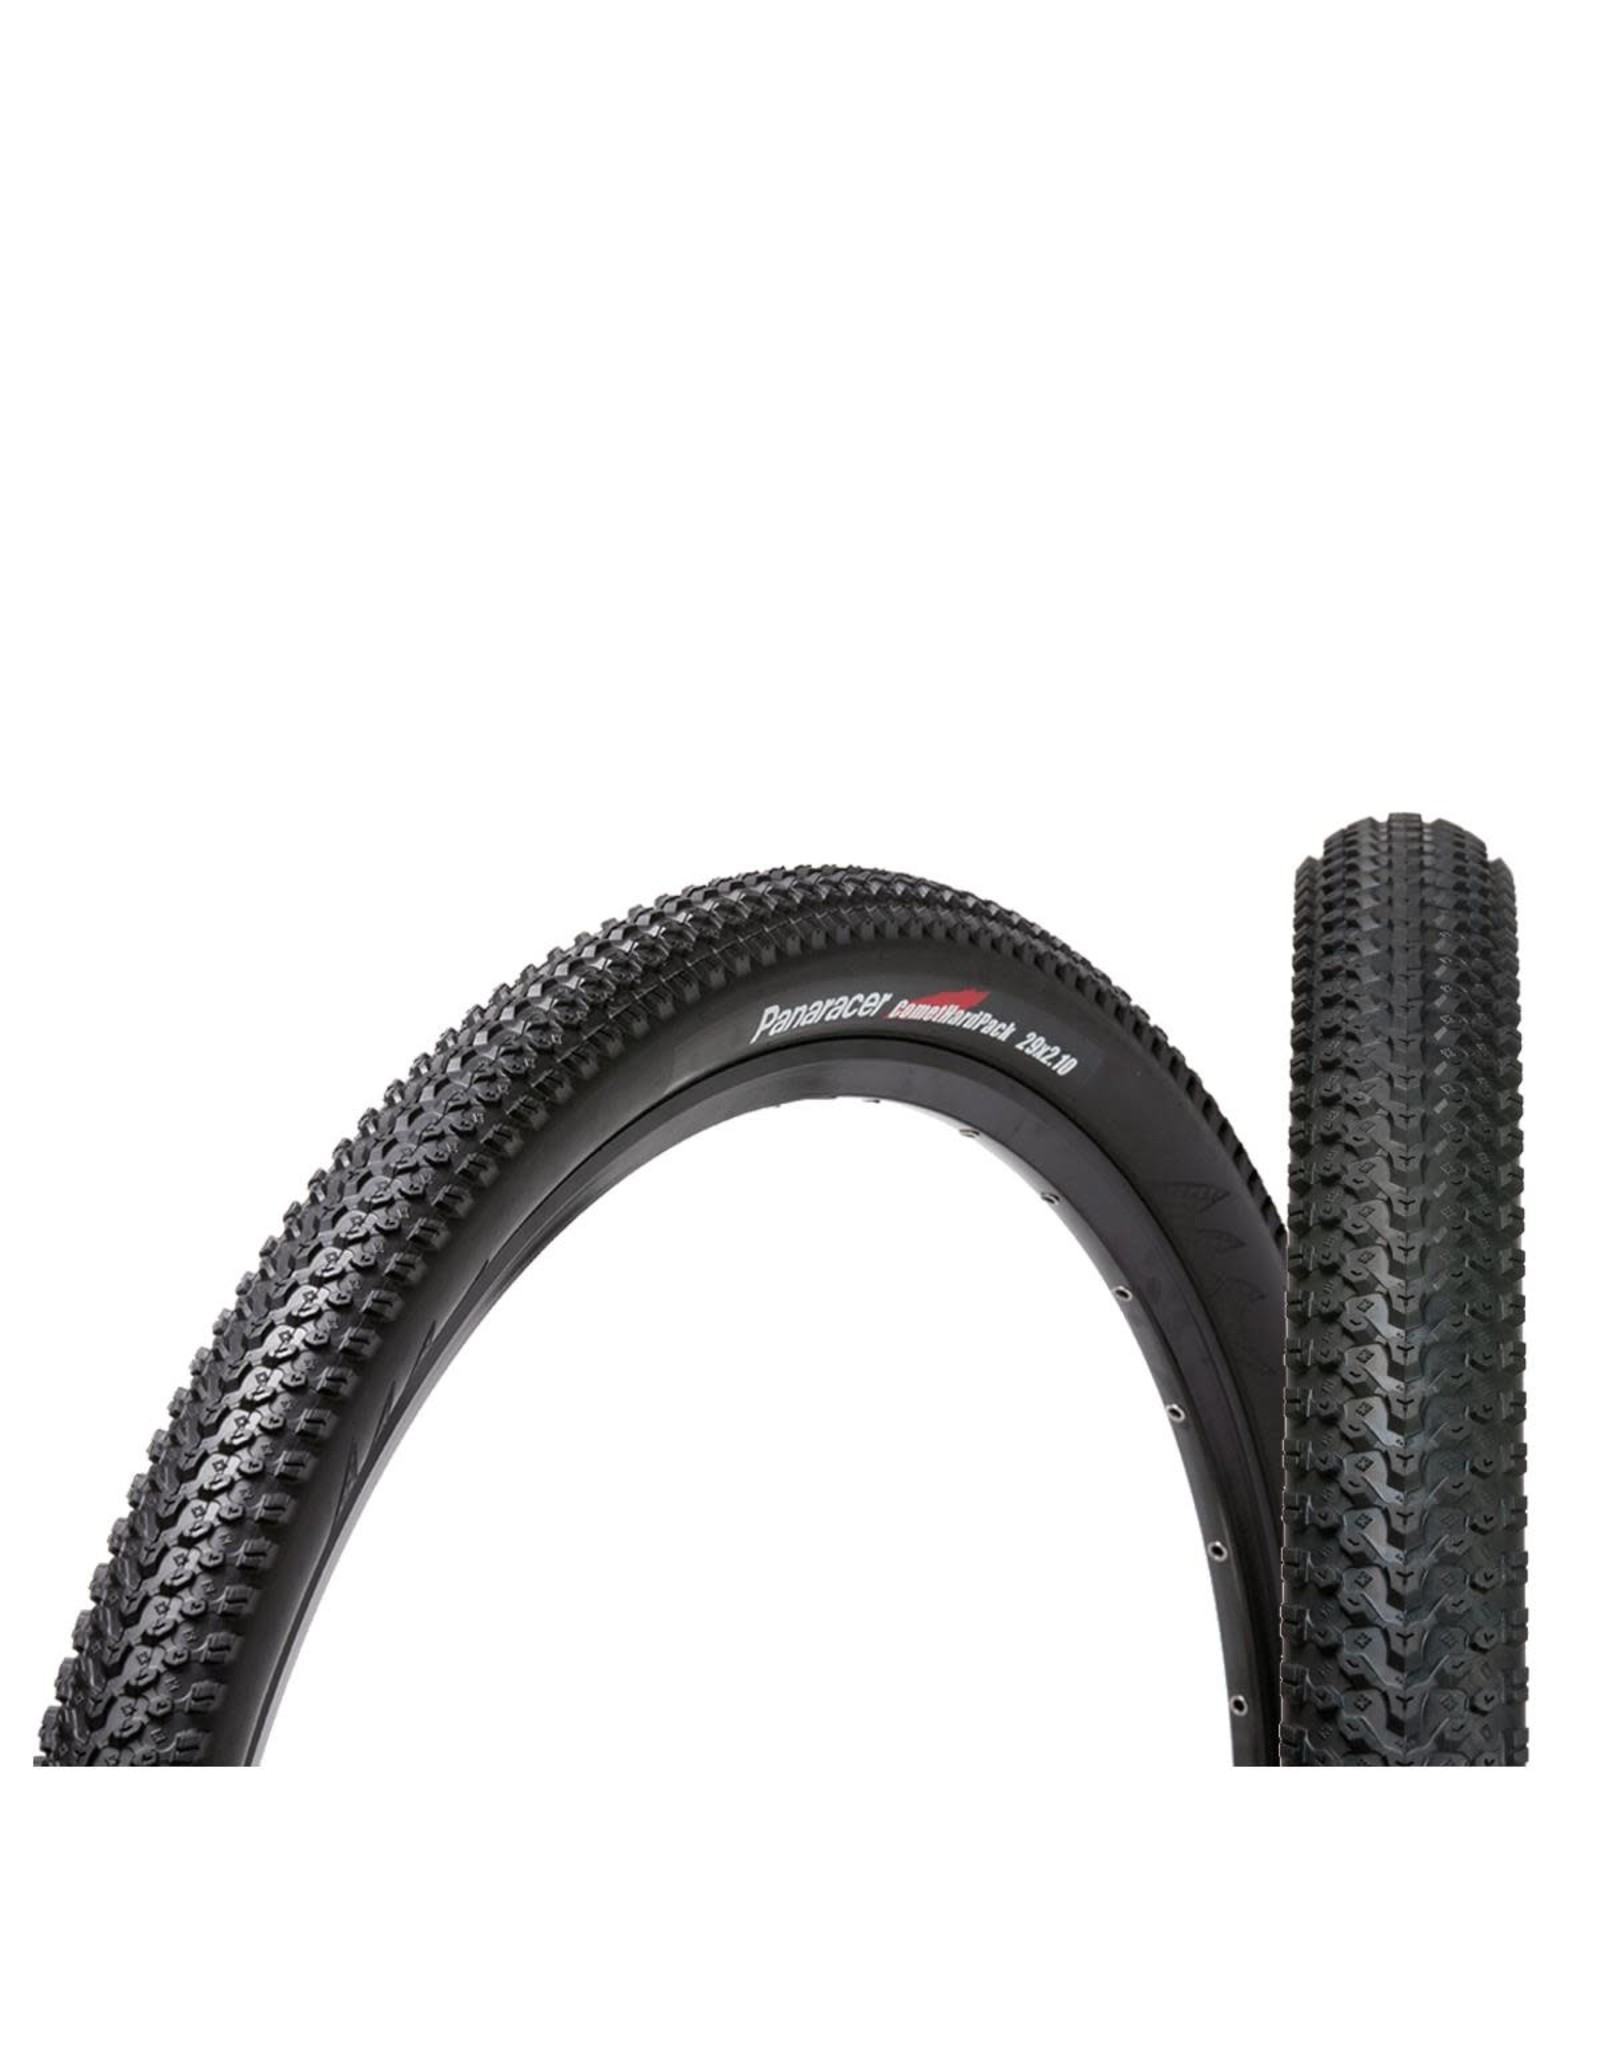 Panaracer Tyre Hard Pack Folding 29 x 2.10